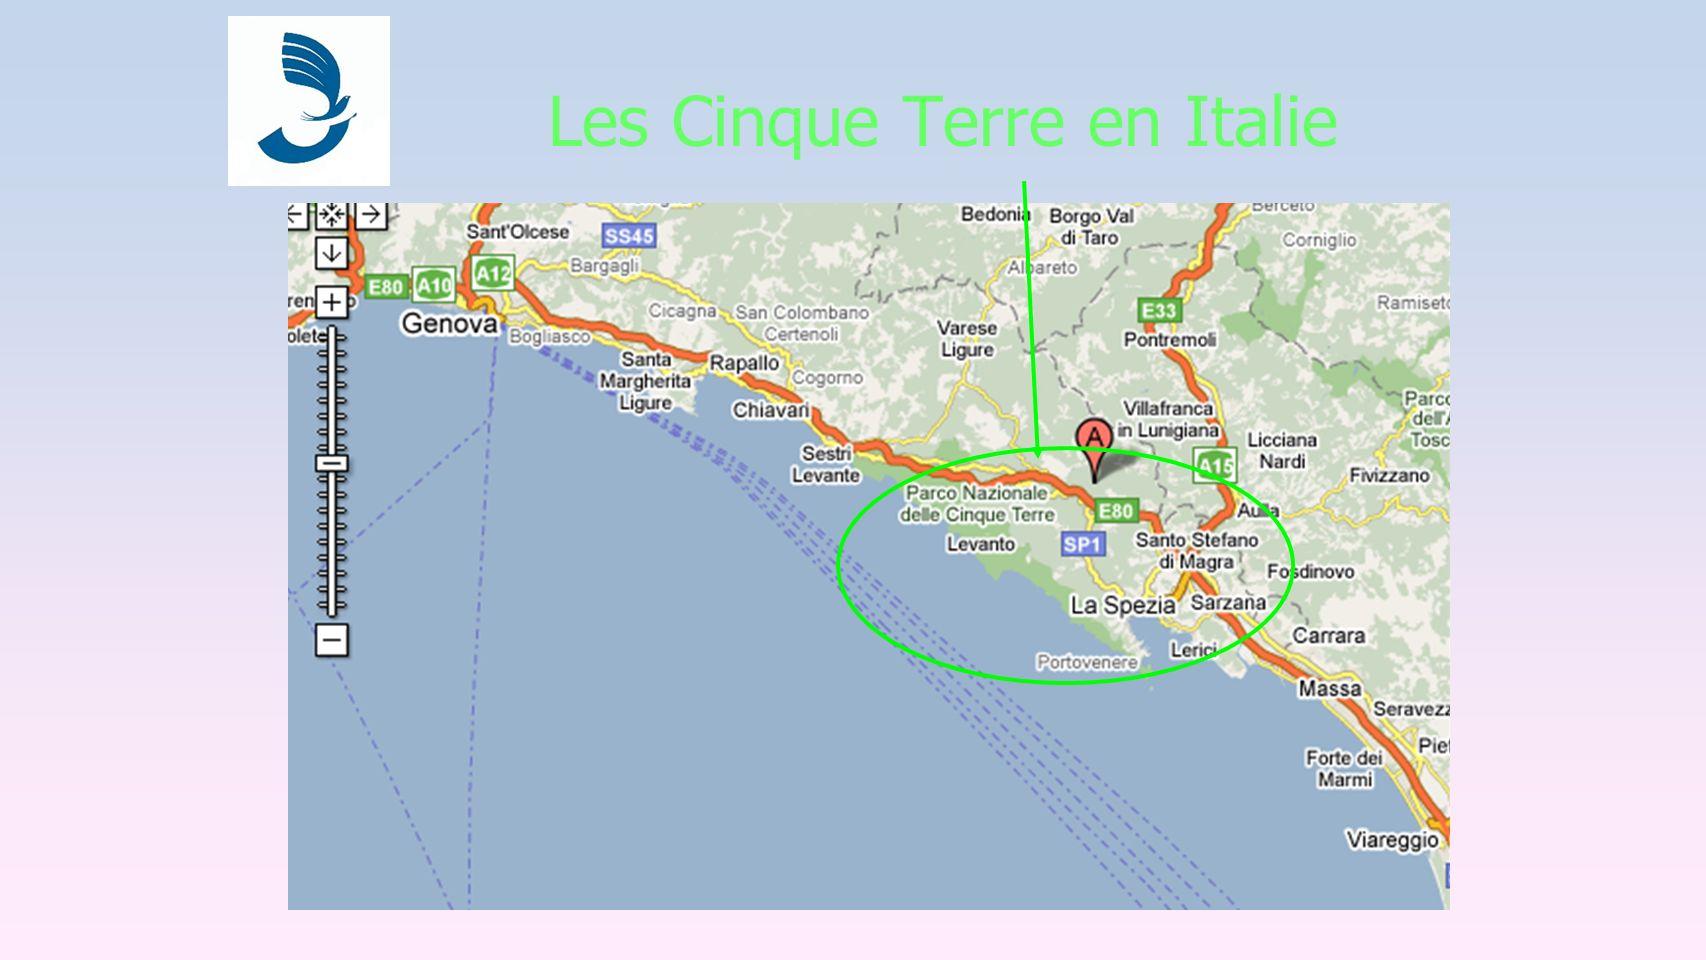 Les Cinque Terre en Italie